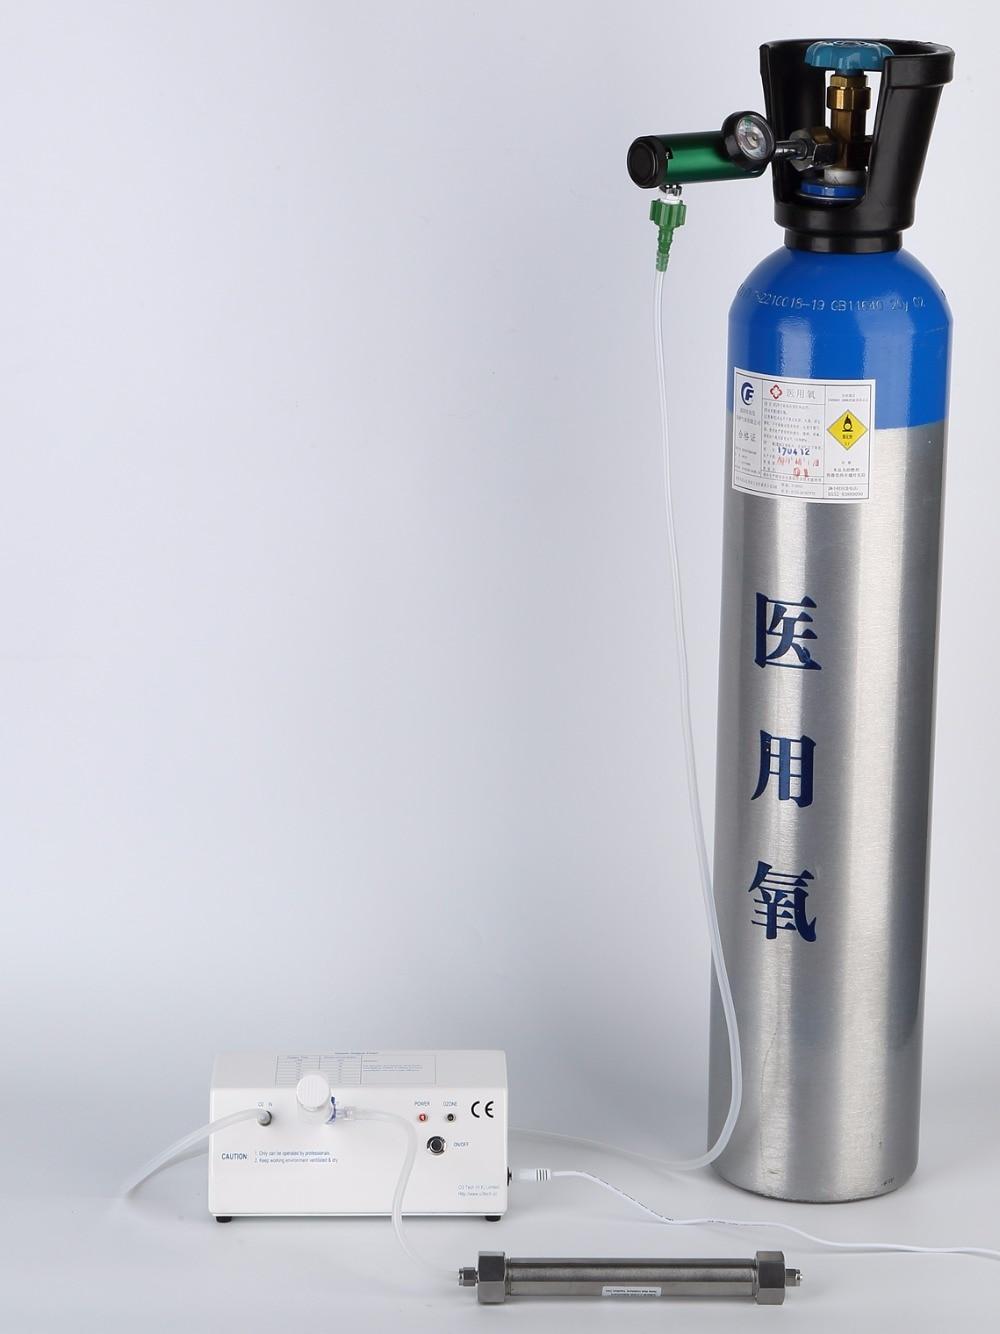 Laboratory ozone generator 12VDC with oxygen regulator oxygen regulator cga540 used on medical ozone generator